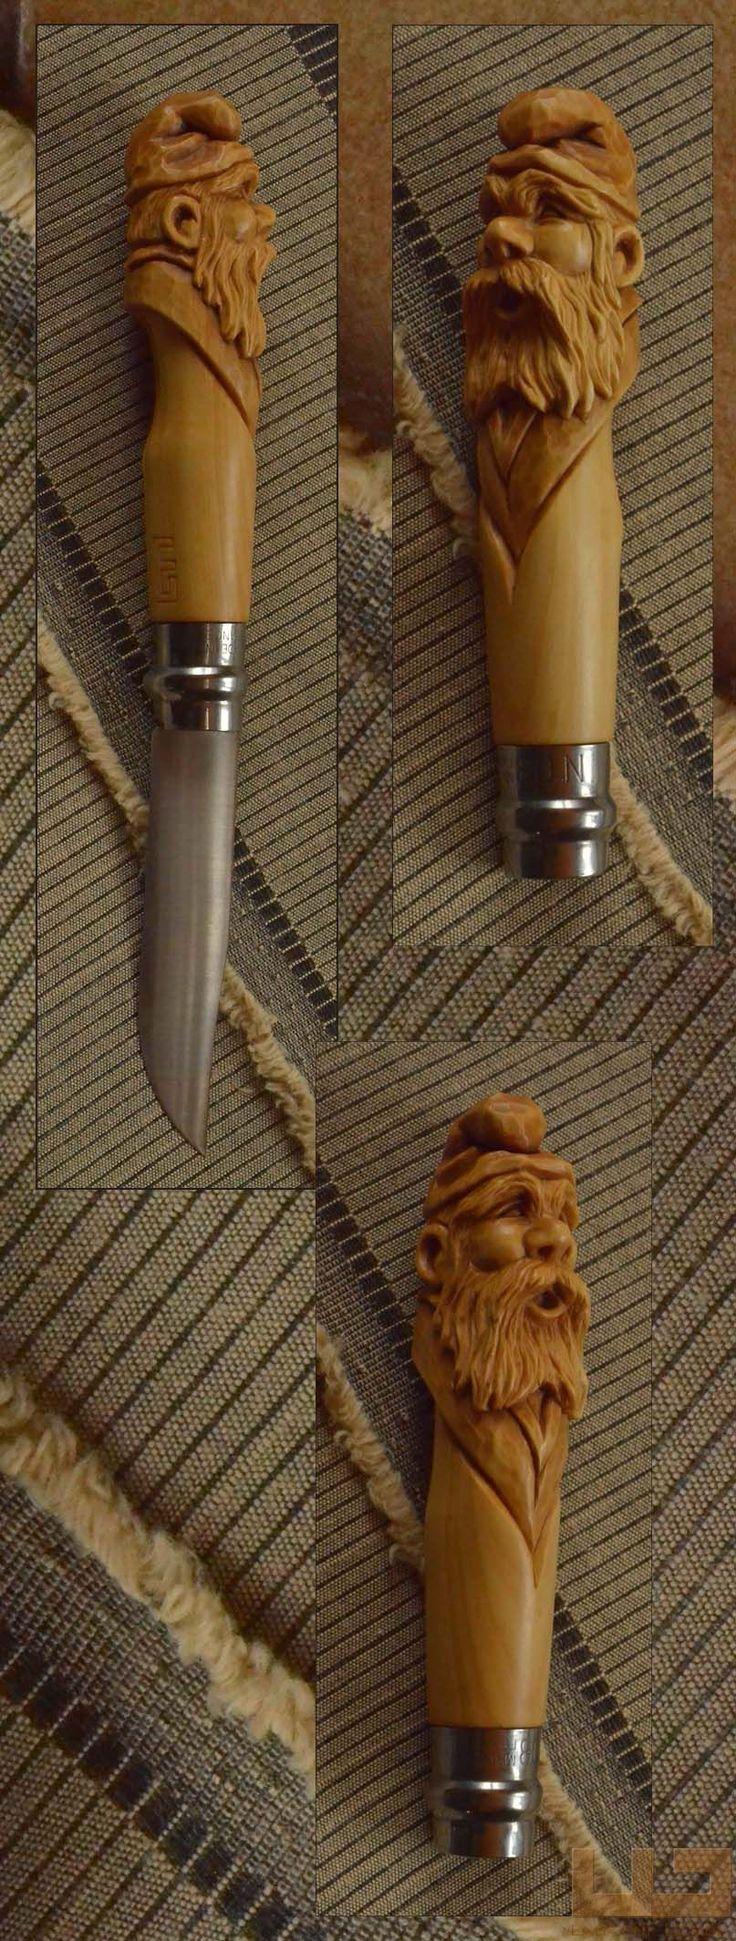 Gerdil Лоран - Скульптура - Opinel № 8 самшит ручка